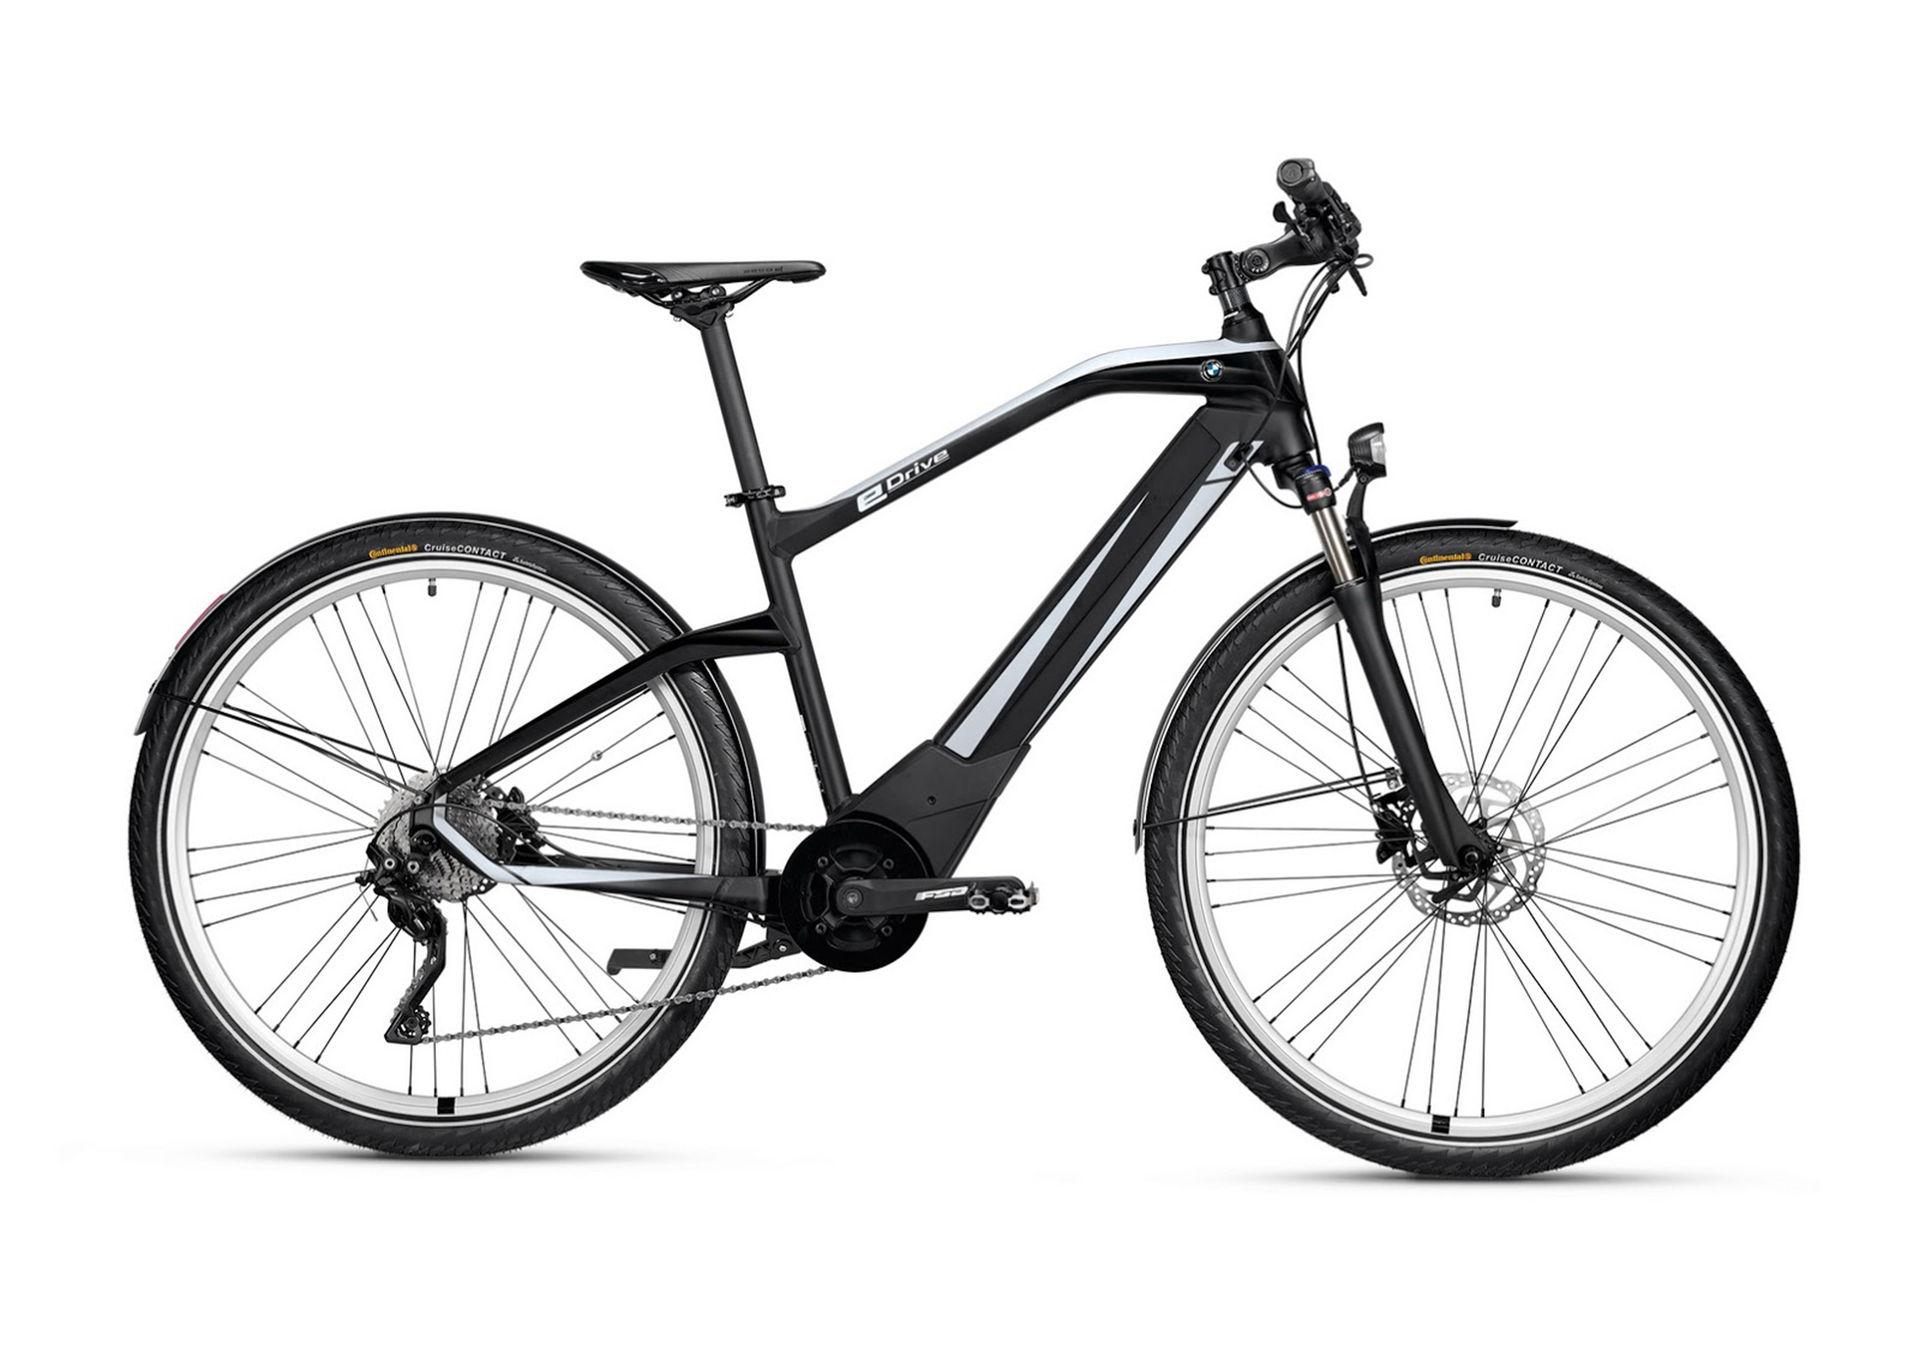 Ny elcykel från BMW